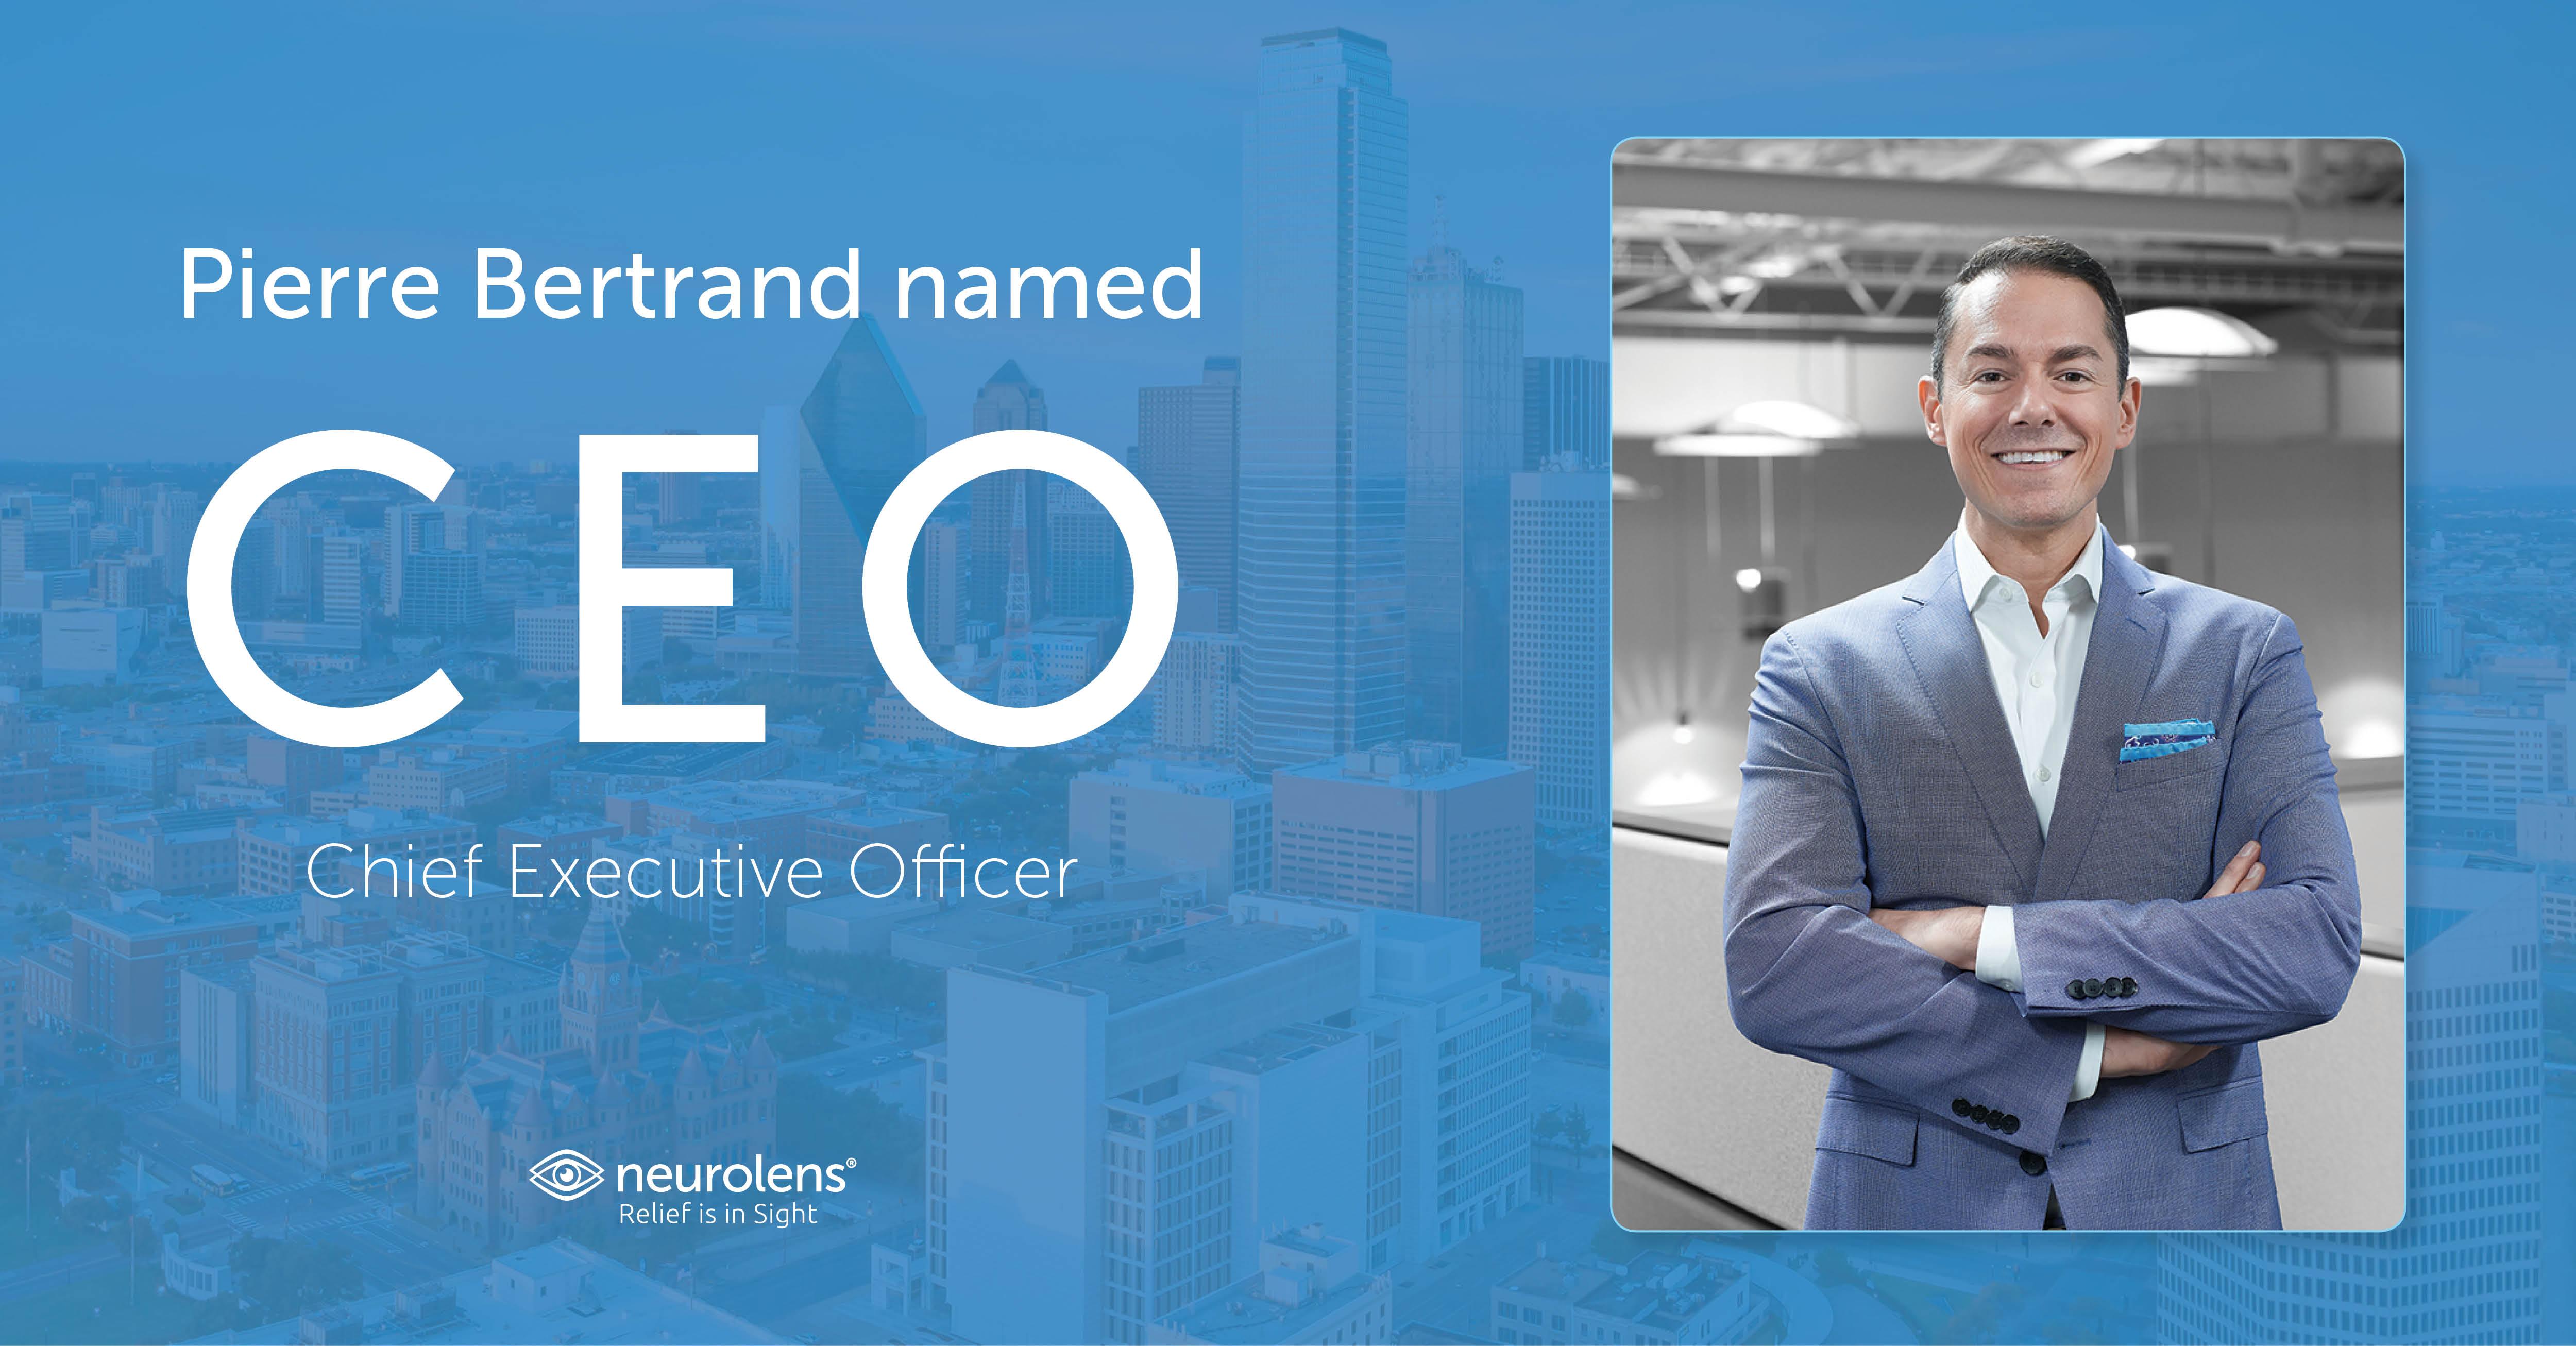 Pierre Bertrand named CEO of Neurolens